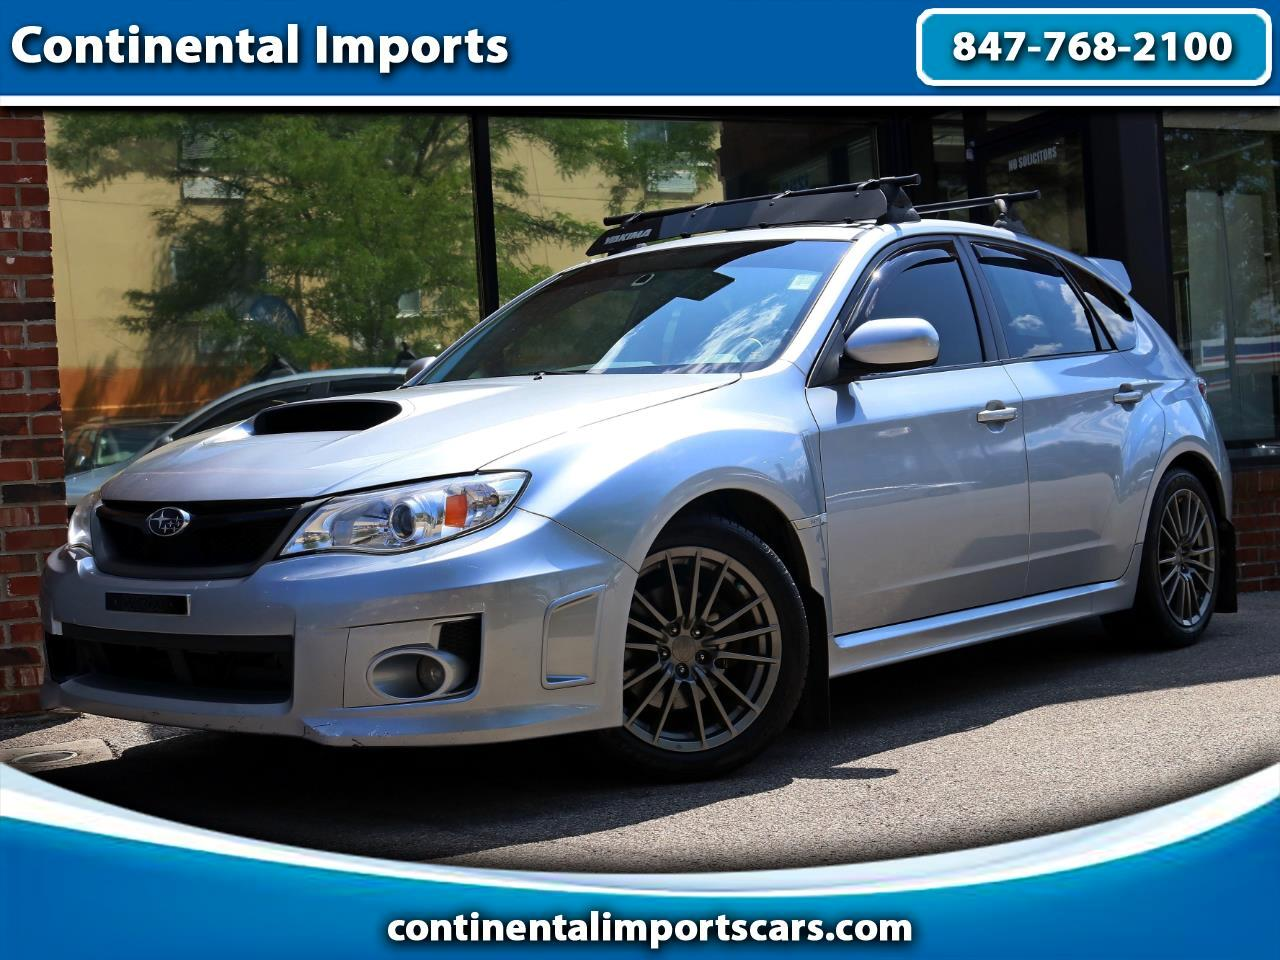 2014 Subaru Impreza WRX Hatchback